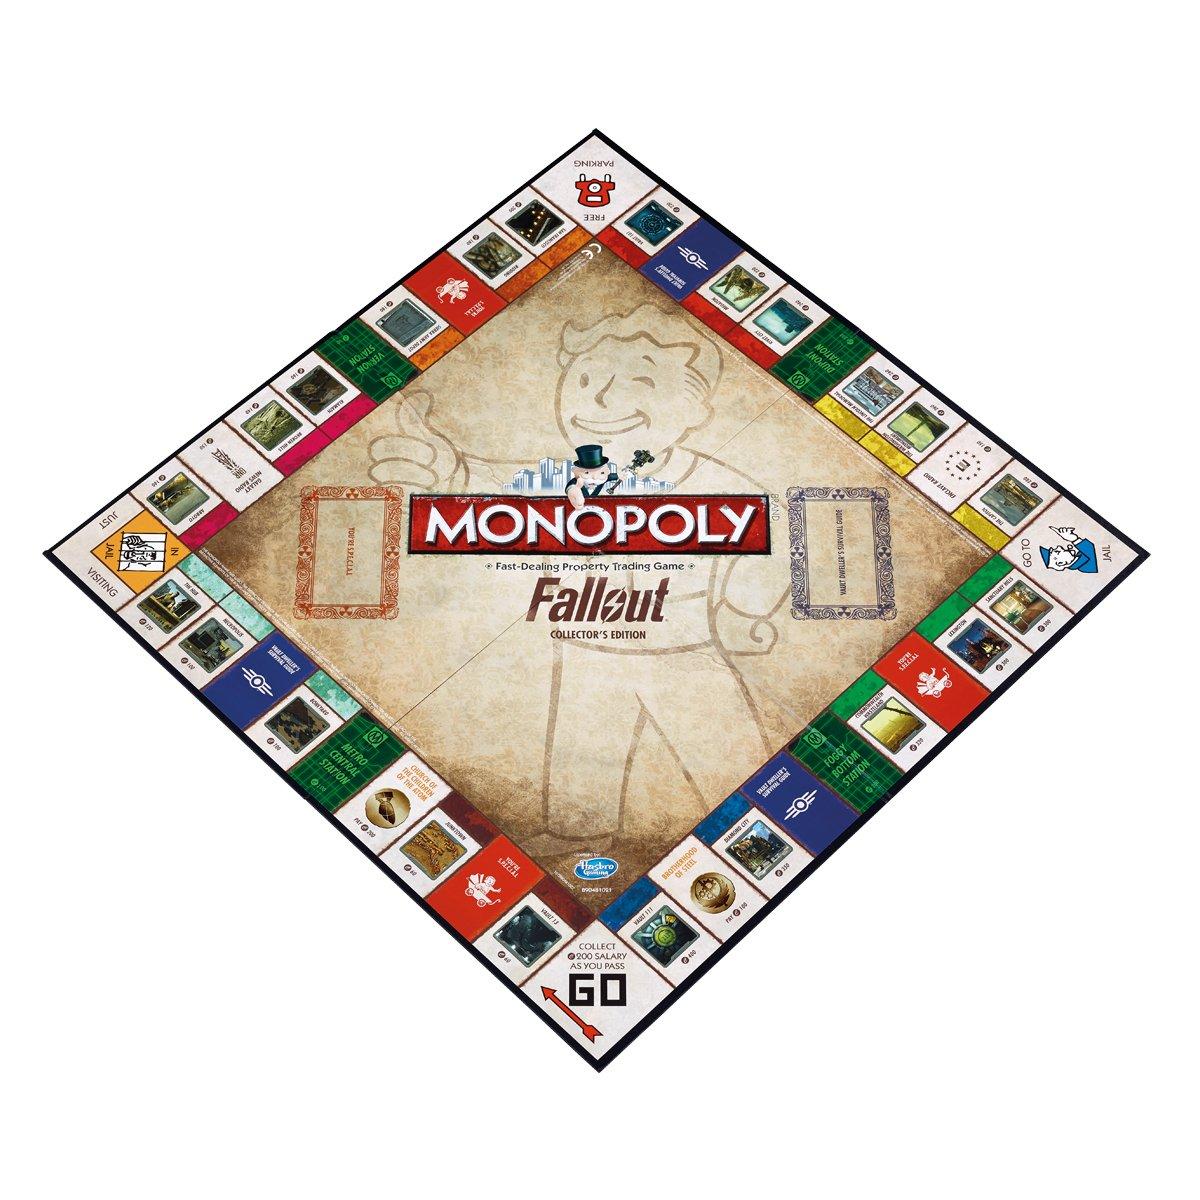 Fallout Monopoly Ingles*: Winning, Moves: Amazon.es: Juguetes y juegos